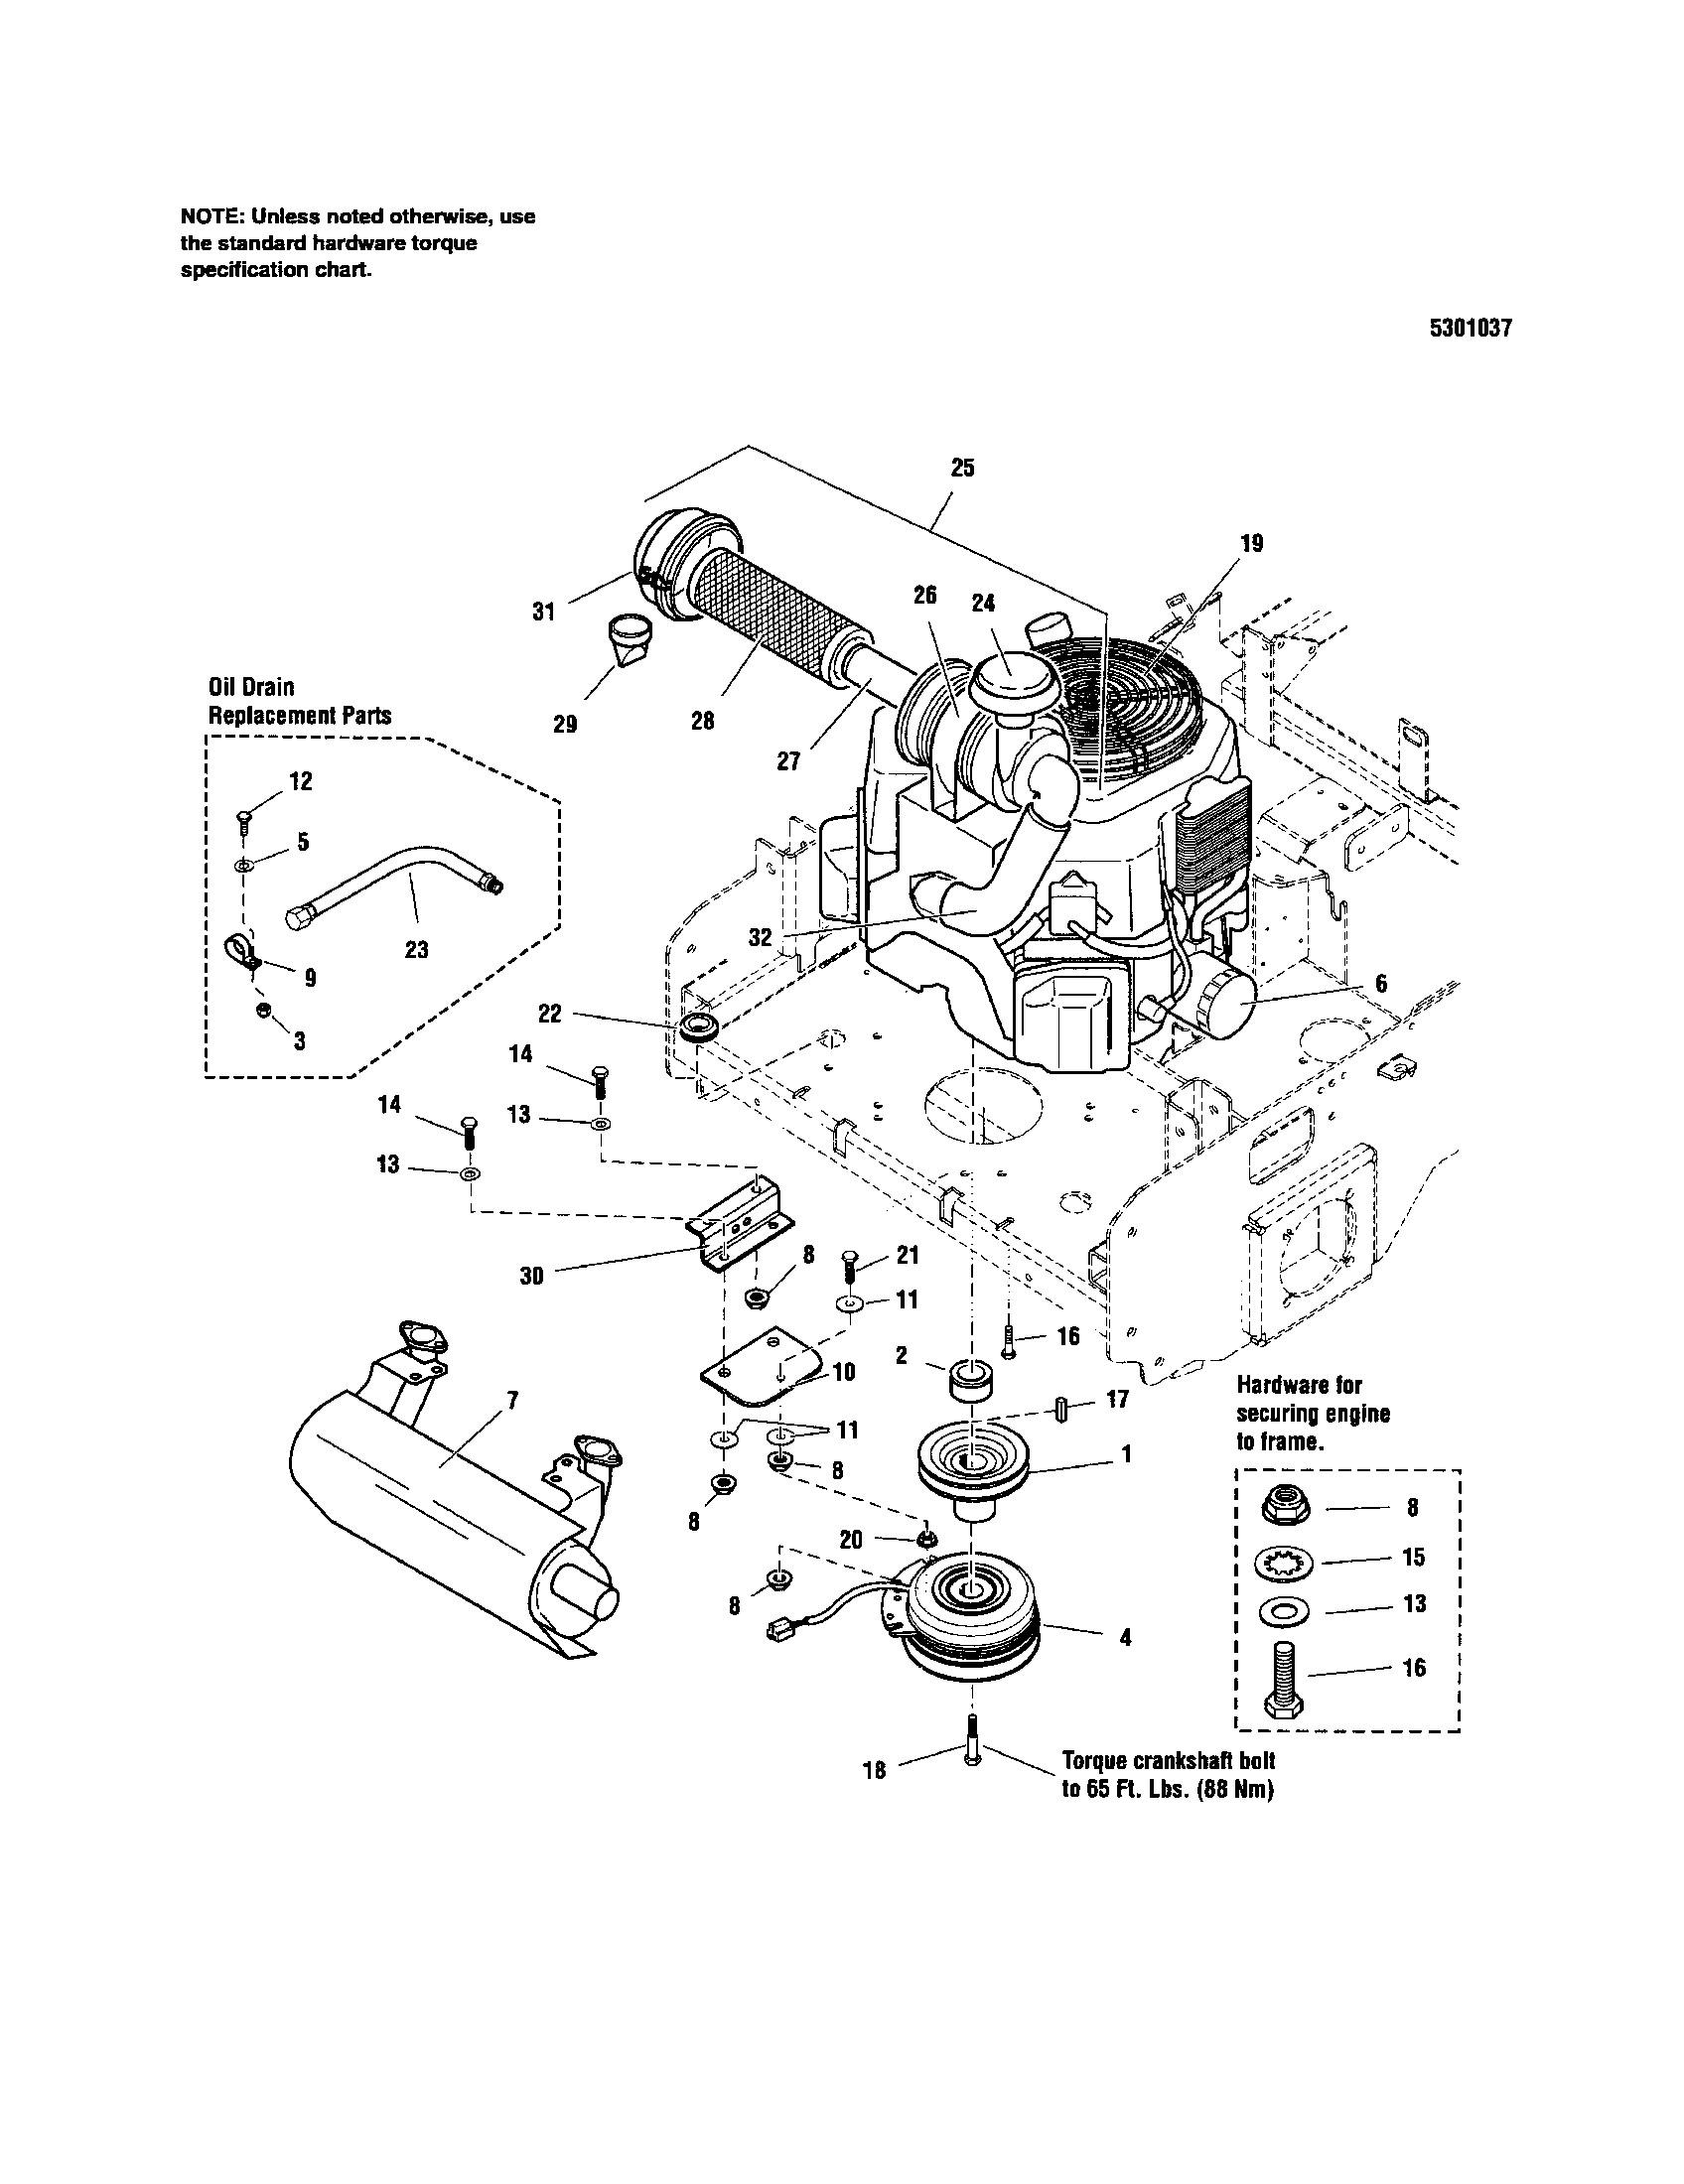 First Hp Kohler Engine Diagram Enthusiast Wiring Diagrams Rh. Fullsize Of Kohler Courage 19 Large. Wiring. Kohler Courage 26 Hp Wiring Diagram At Scoala.co